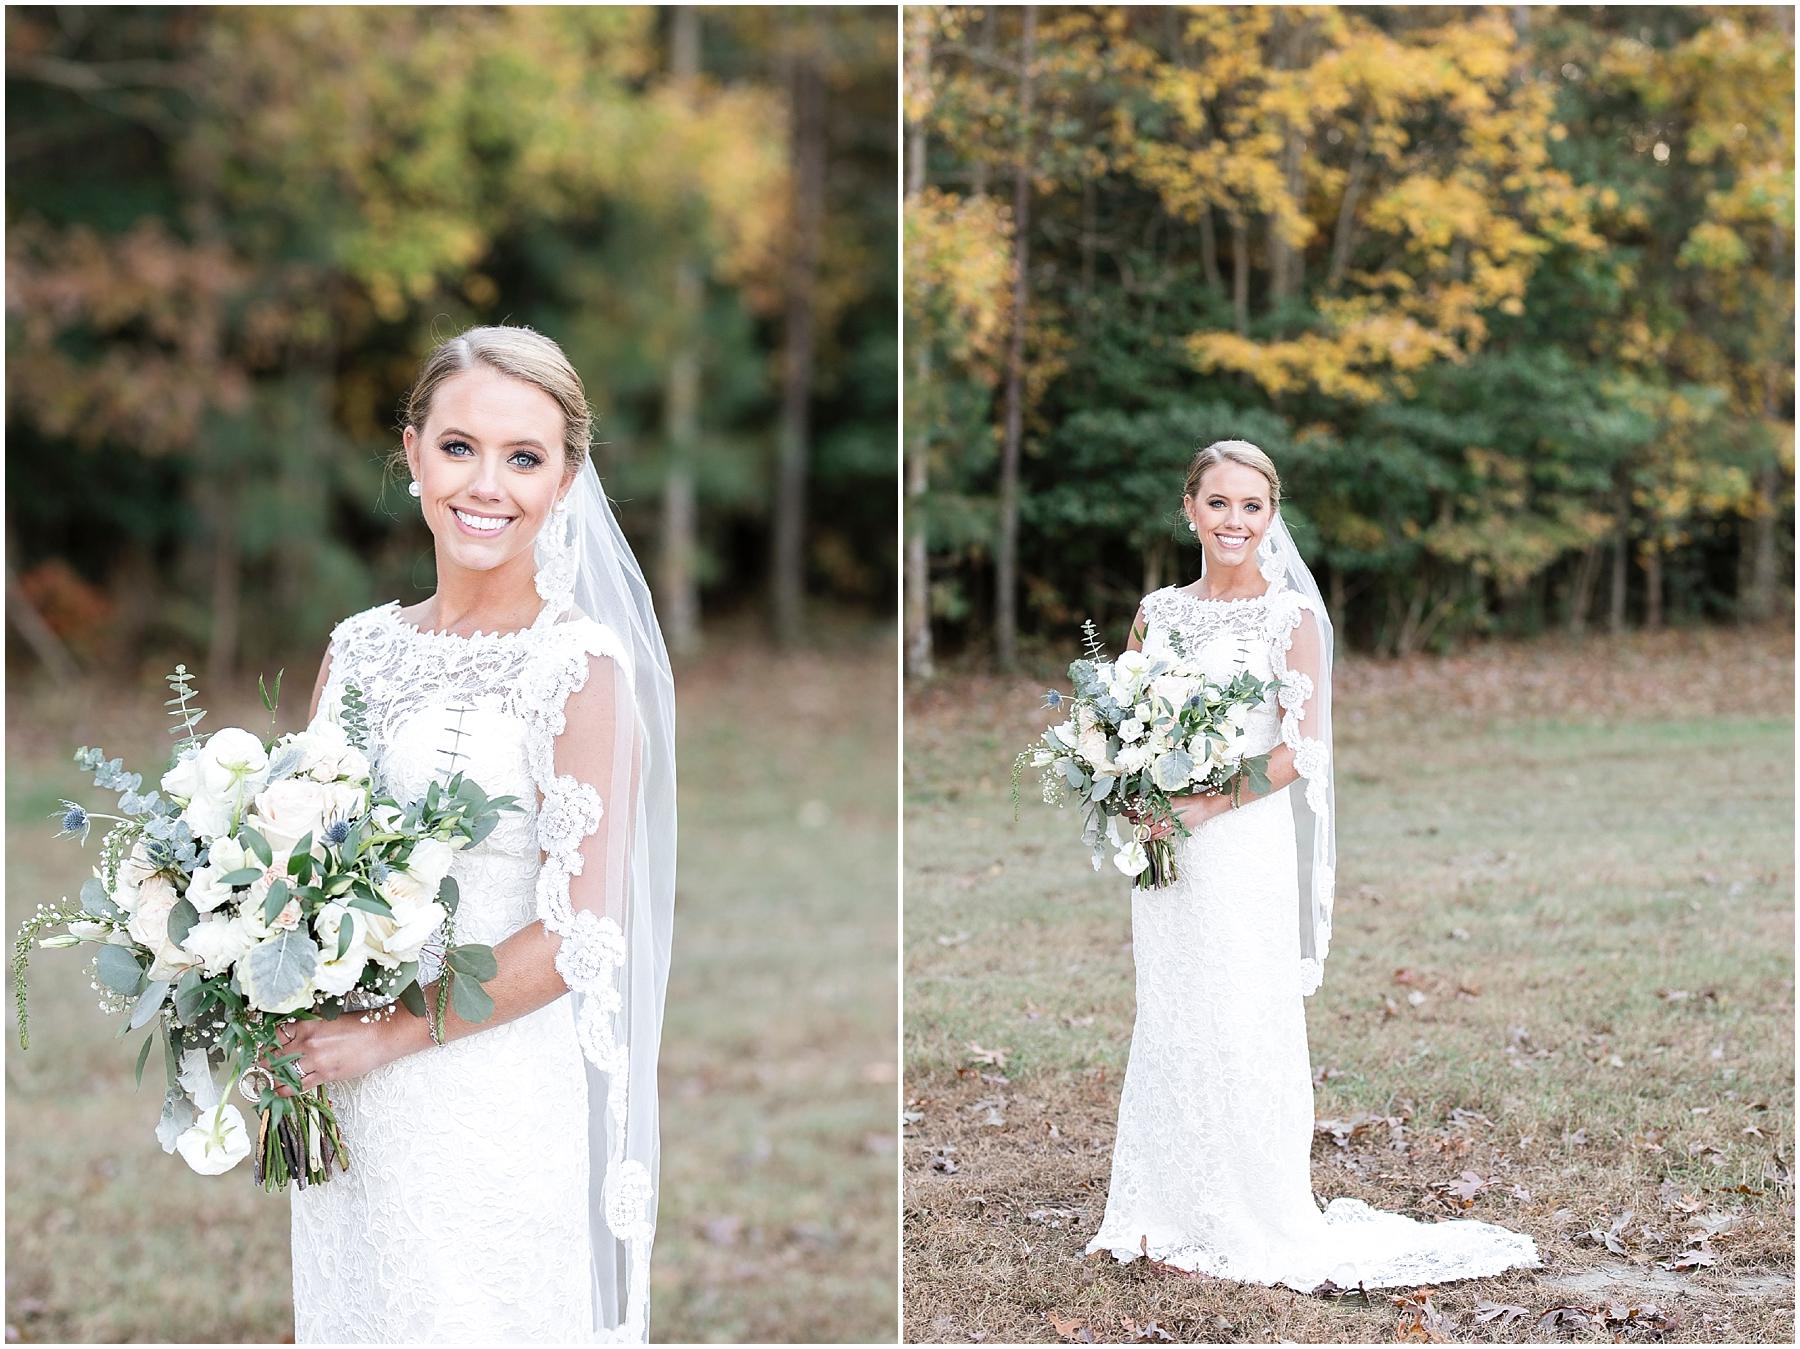 Harley's Haven Wedding, Smithfiled, Virginia